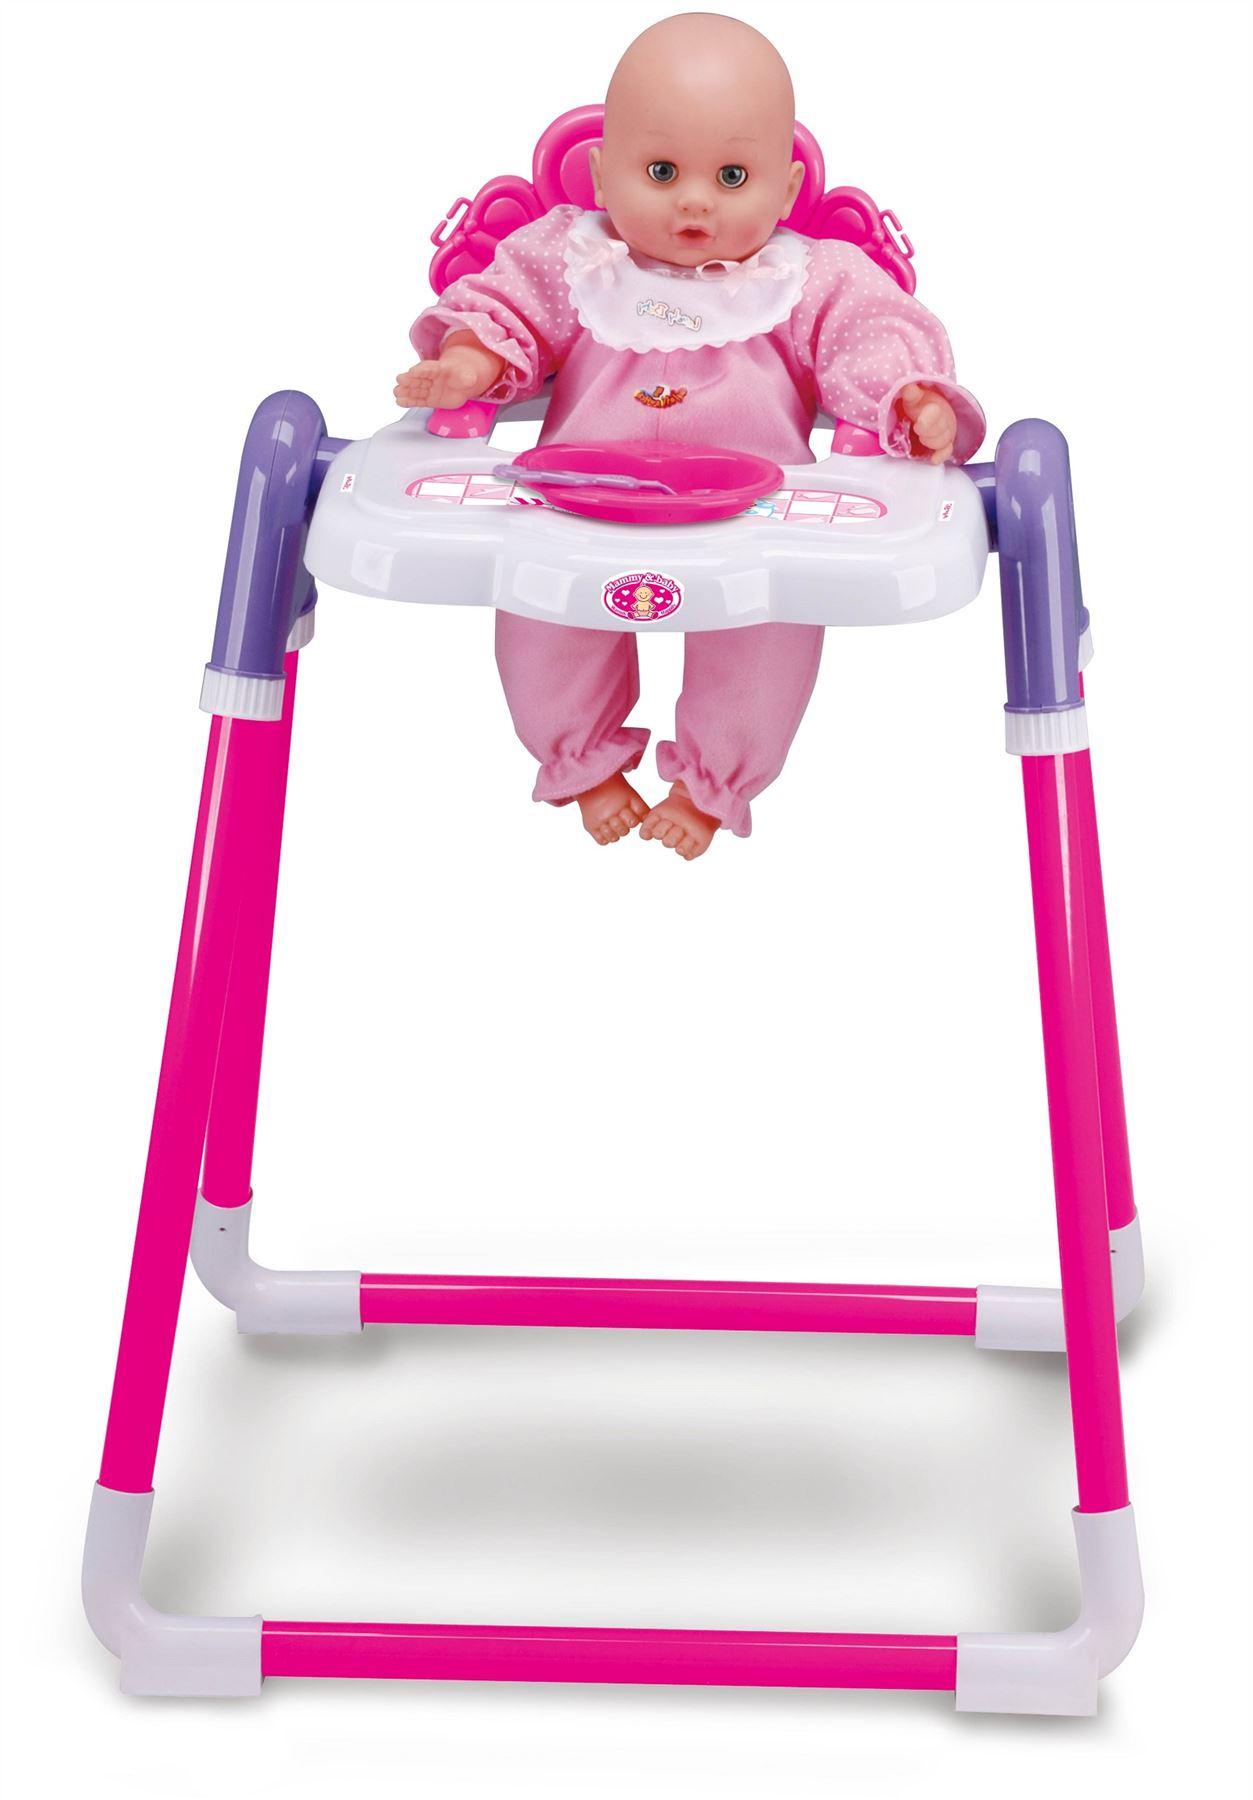 baby toy high chair set rocking cushion doll childrens kids pretend play feeding